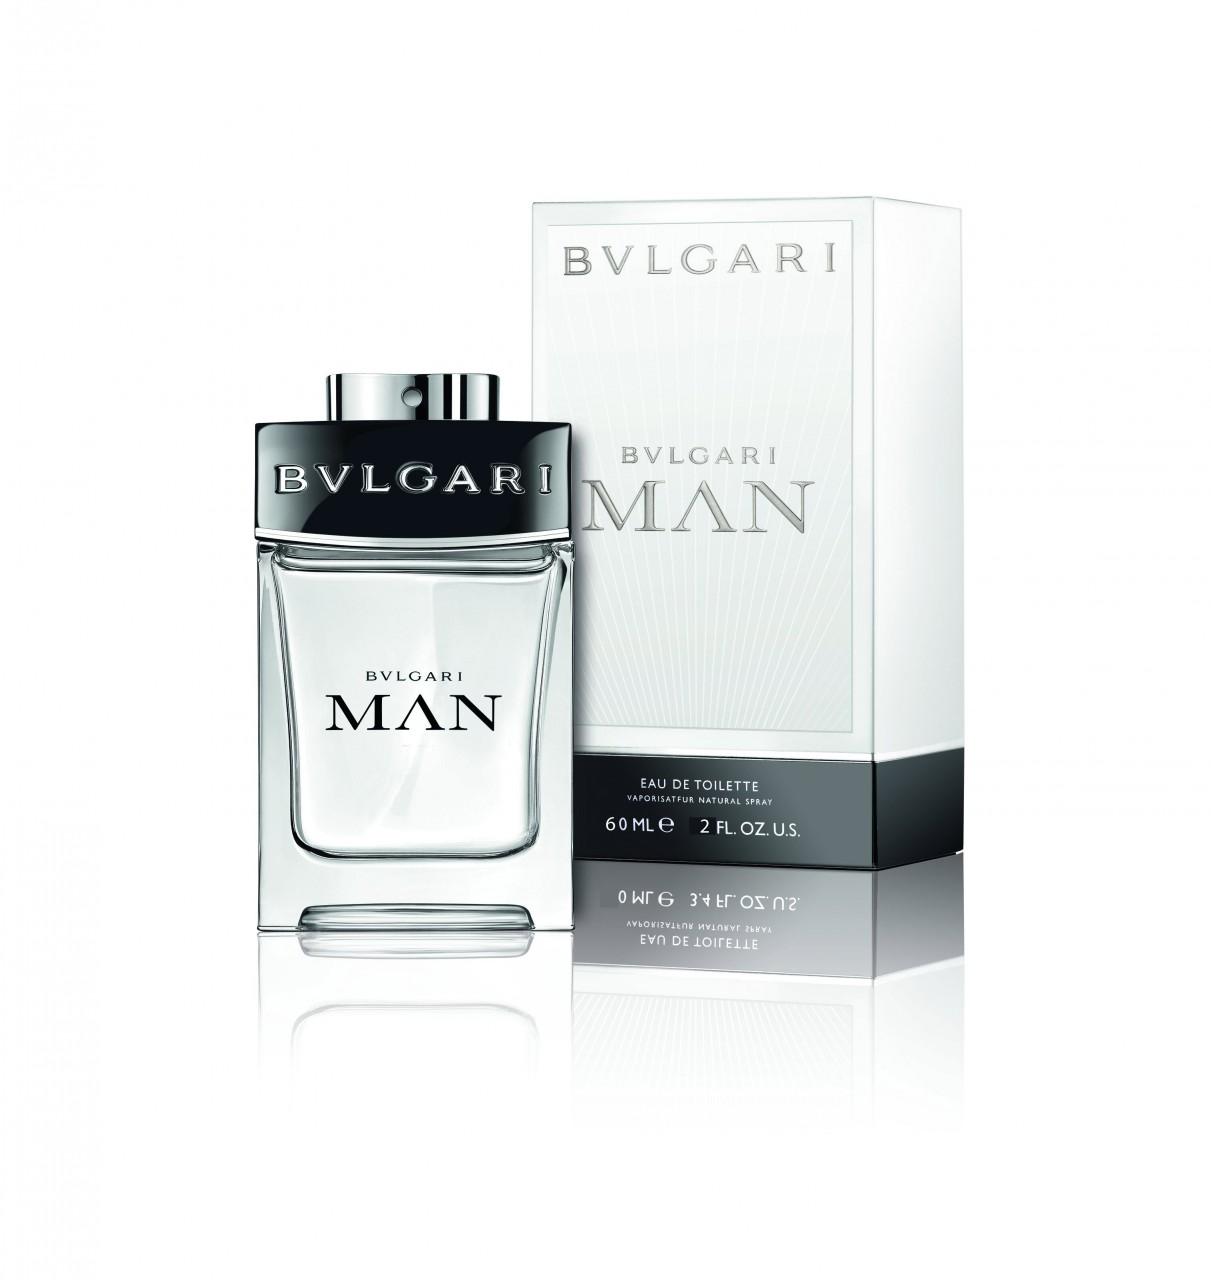 Bvlgari Bvlgari Man, Toaletní voda, 60ml, Pánska vôňa, + AKCE: dárek zdarma